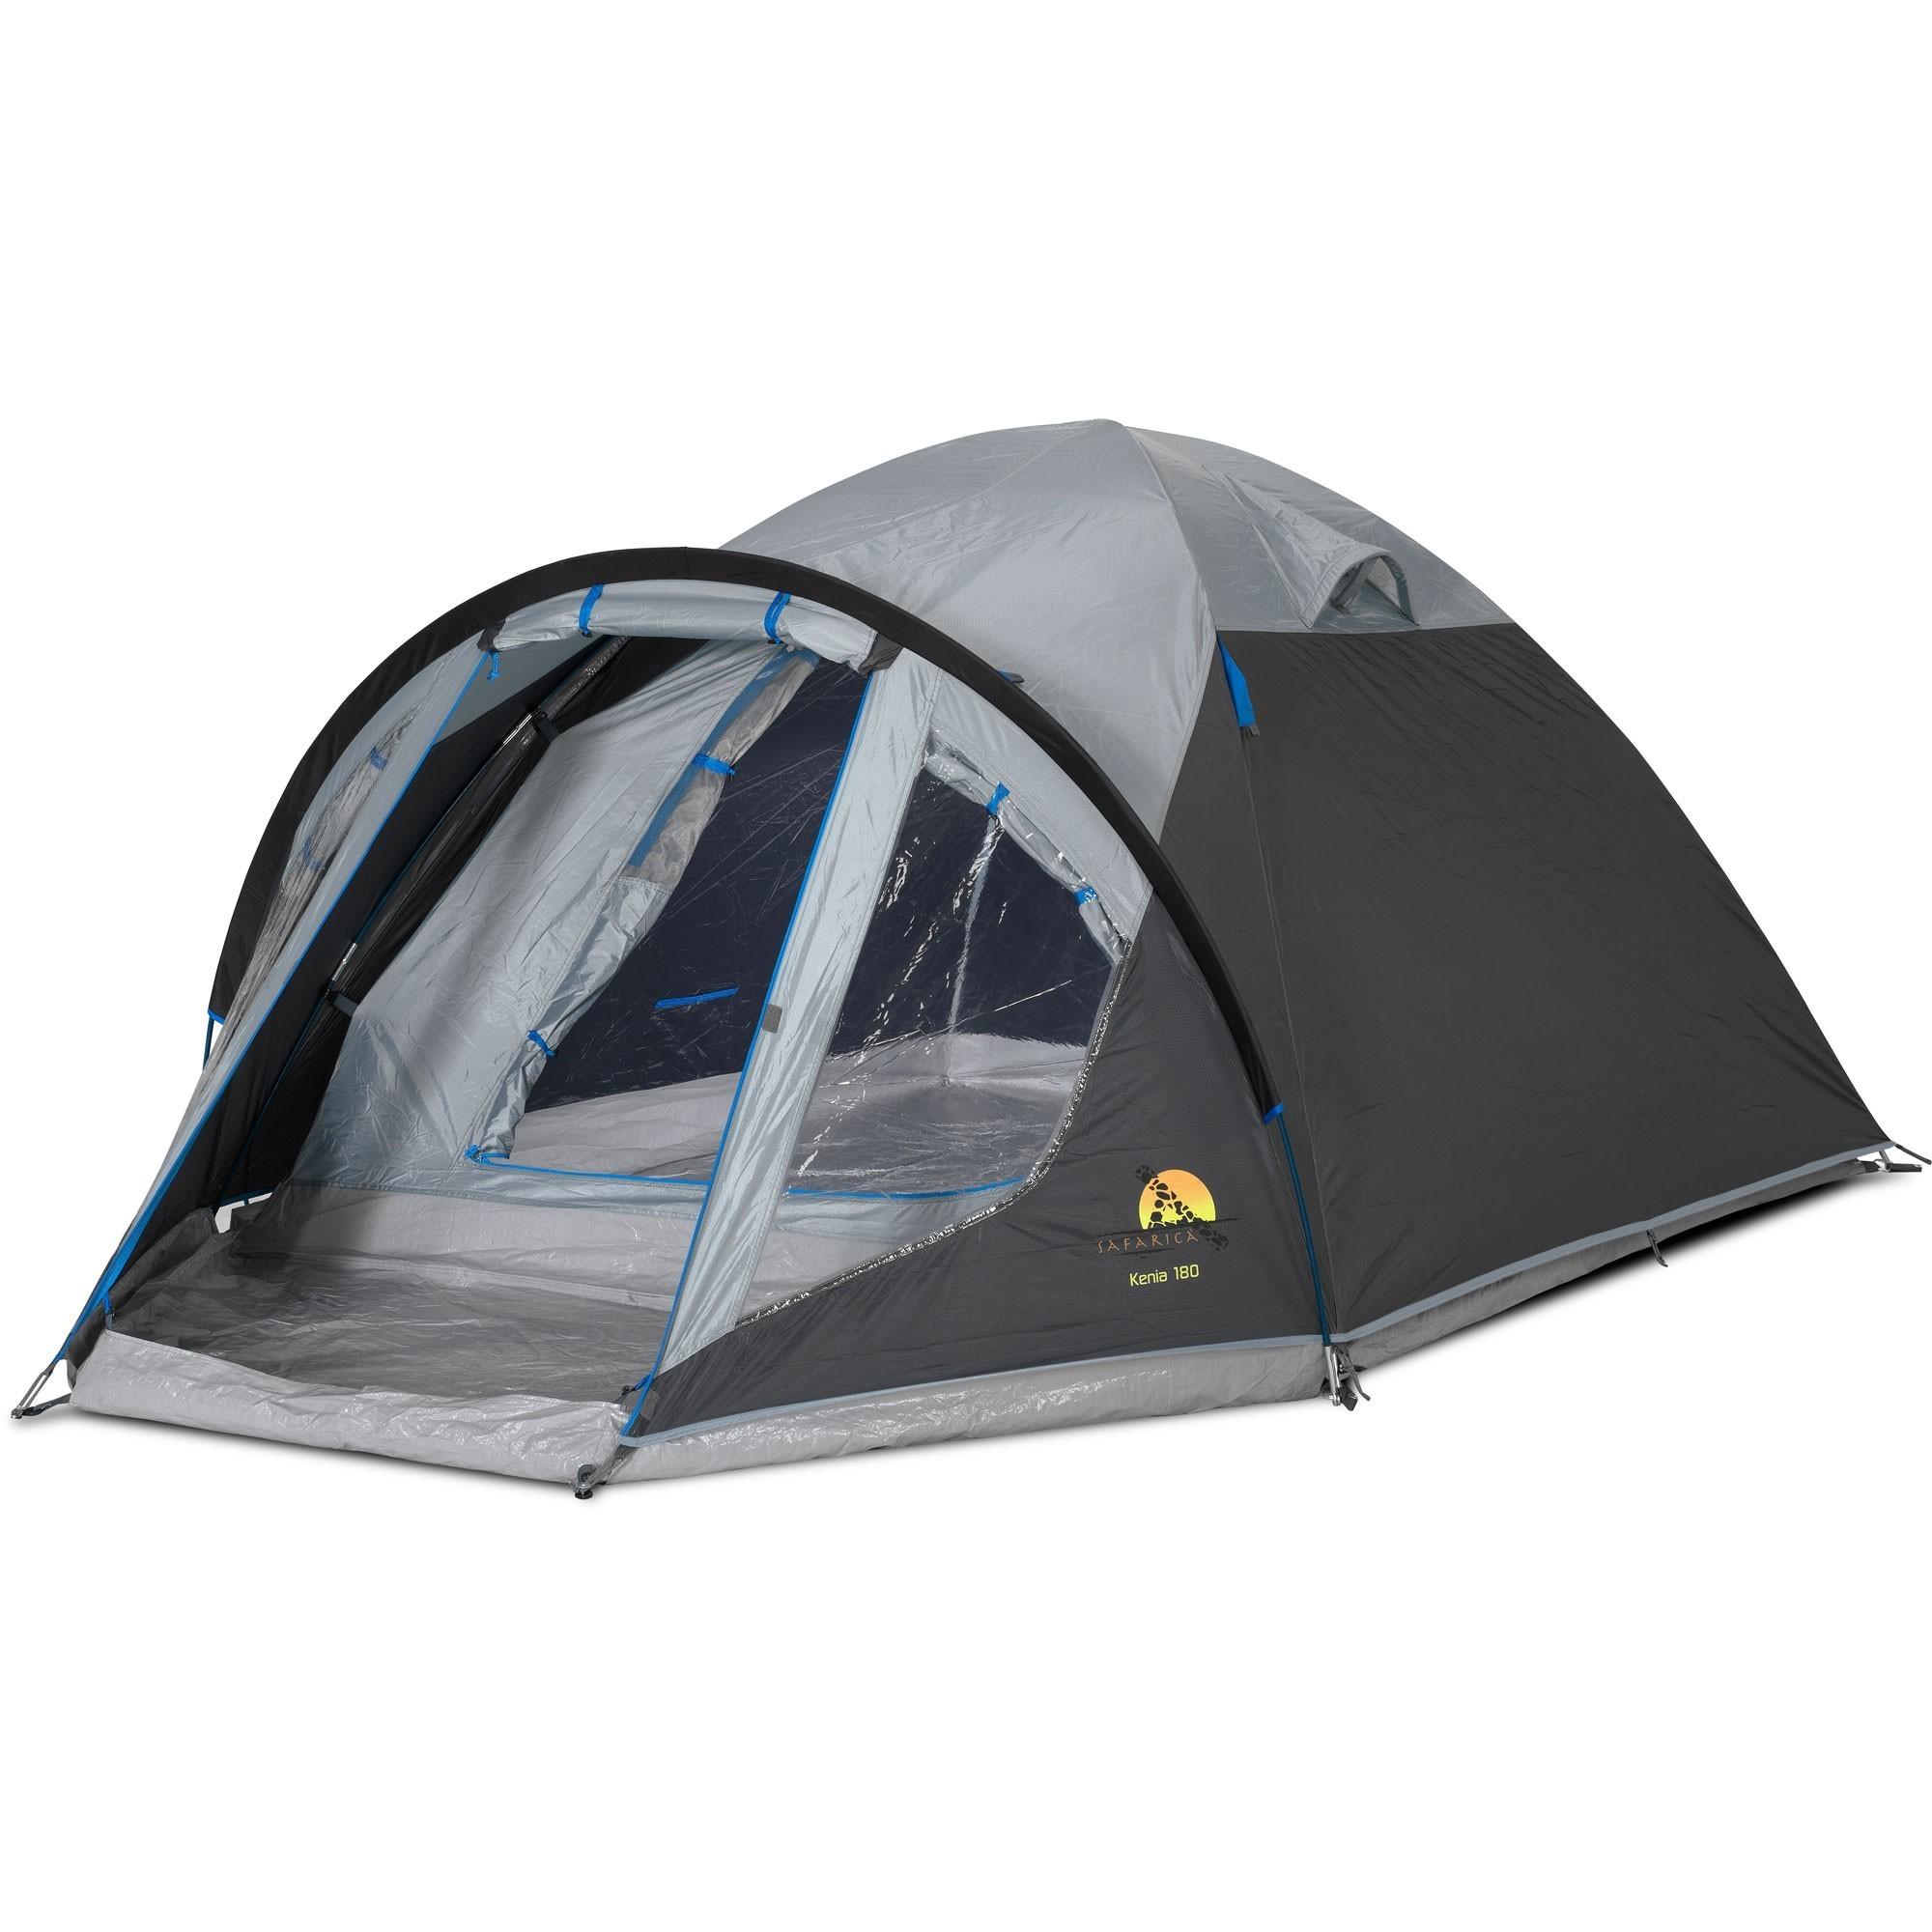 beautiful tente cuisine pour camping suggestion. Black Bedroom Furniture Sets. Home Design Ideas